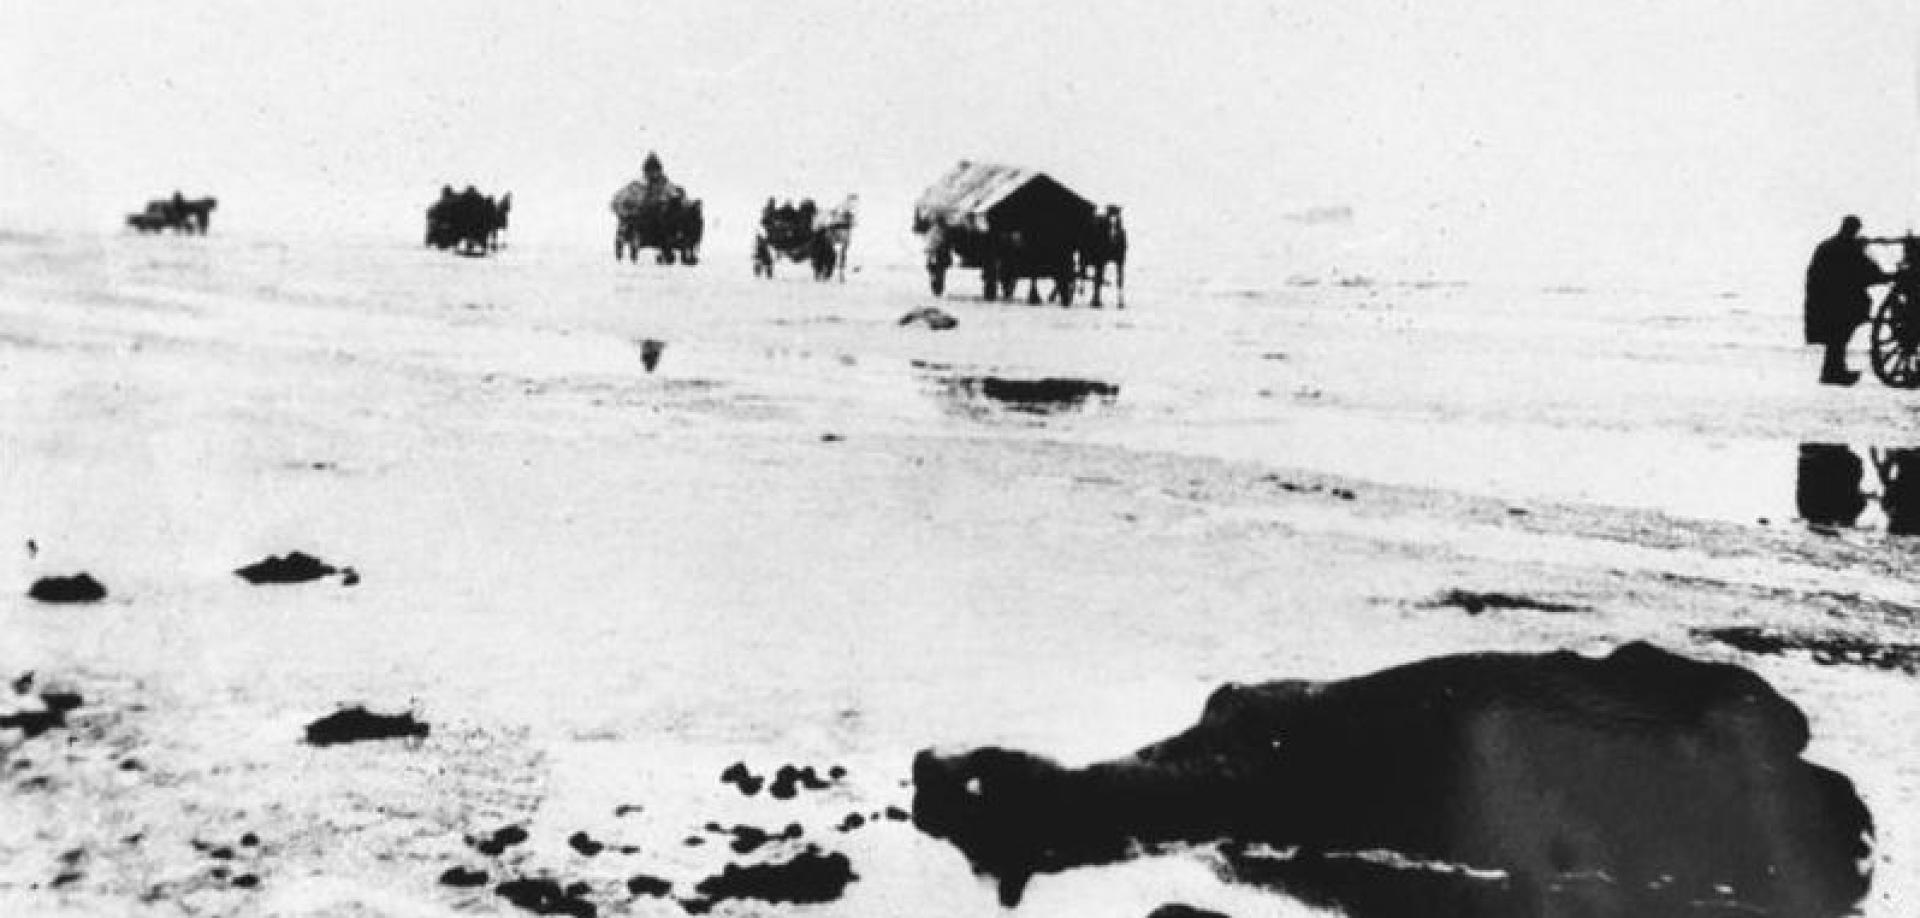 Datei:Bundesarchiv Bild 146-1990-001-30, Flüchtlingstreck.jpg